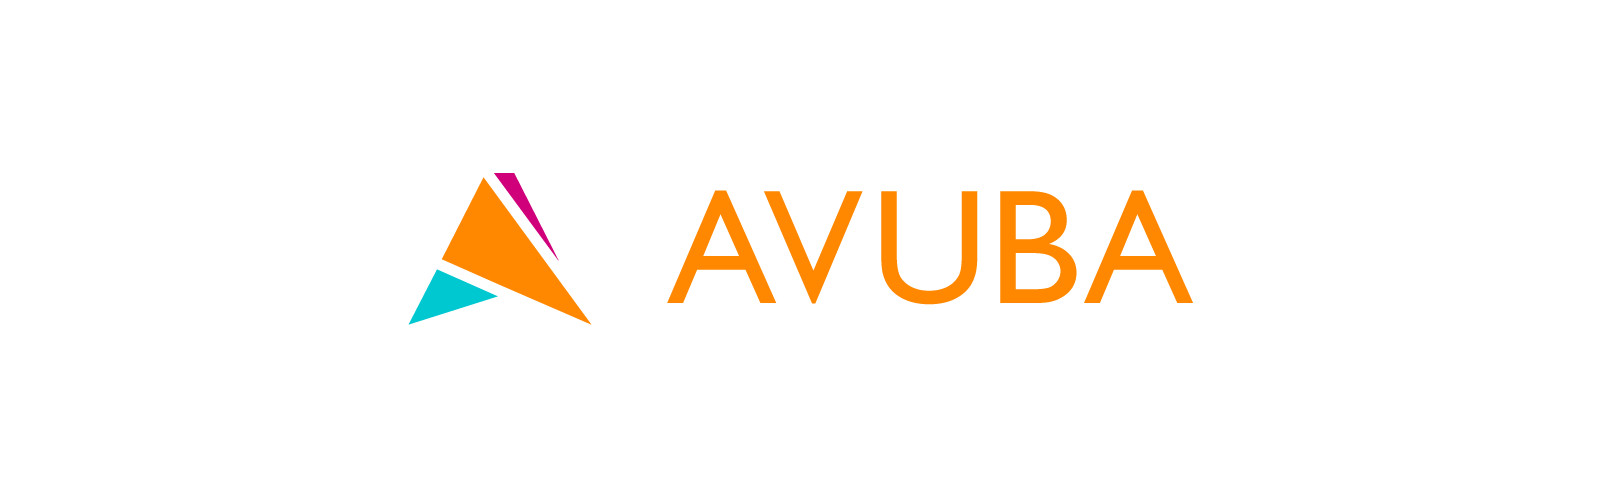 Avuba Logo